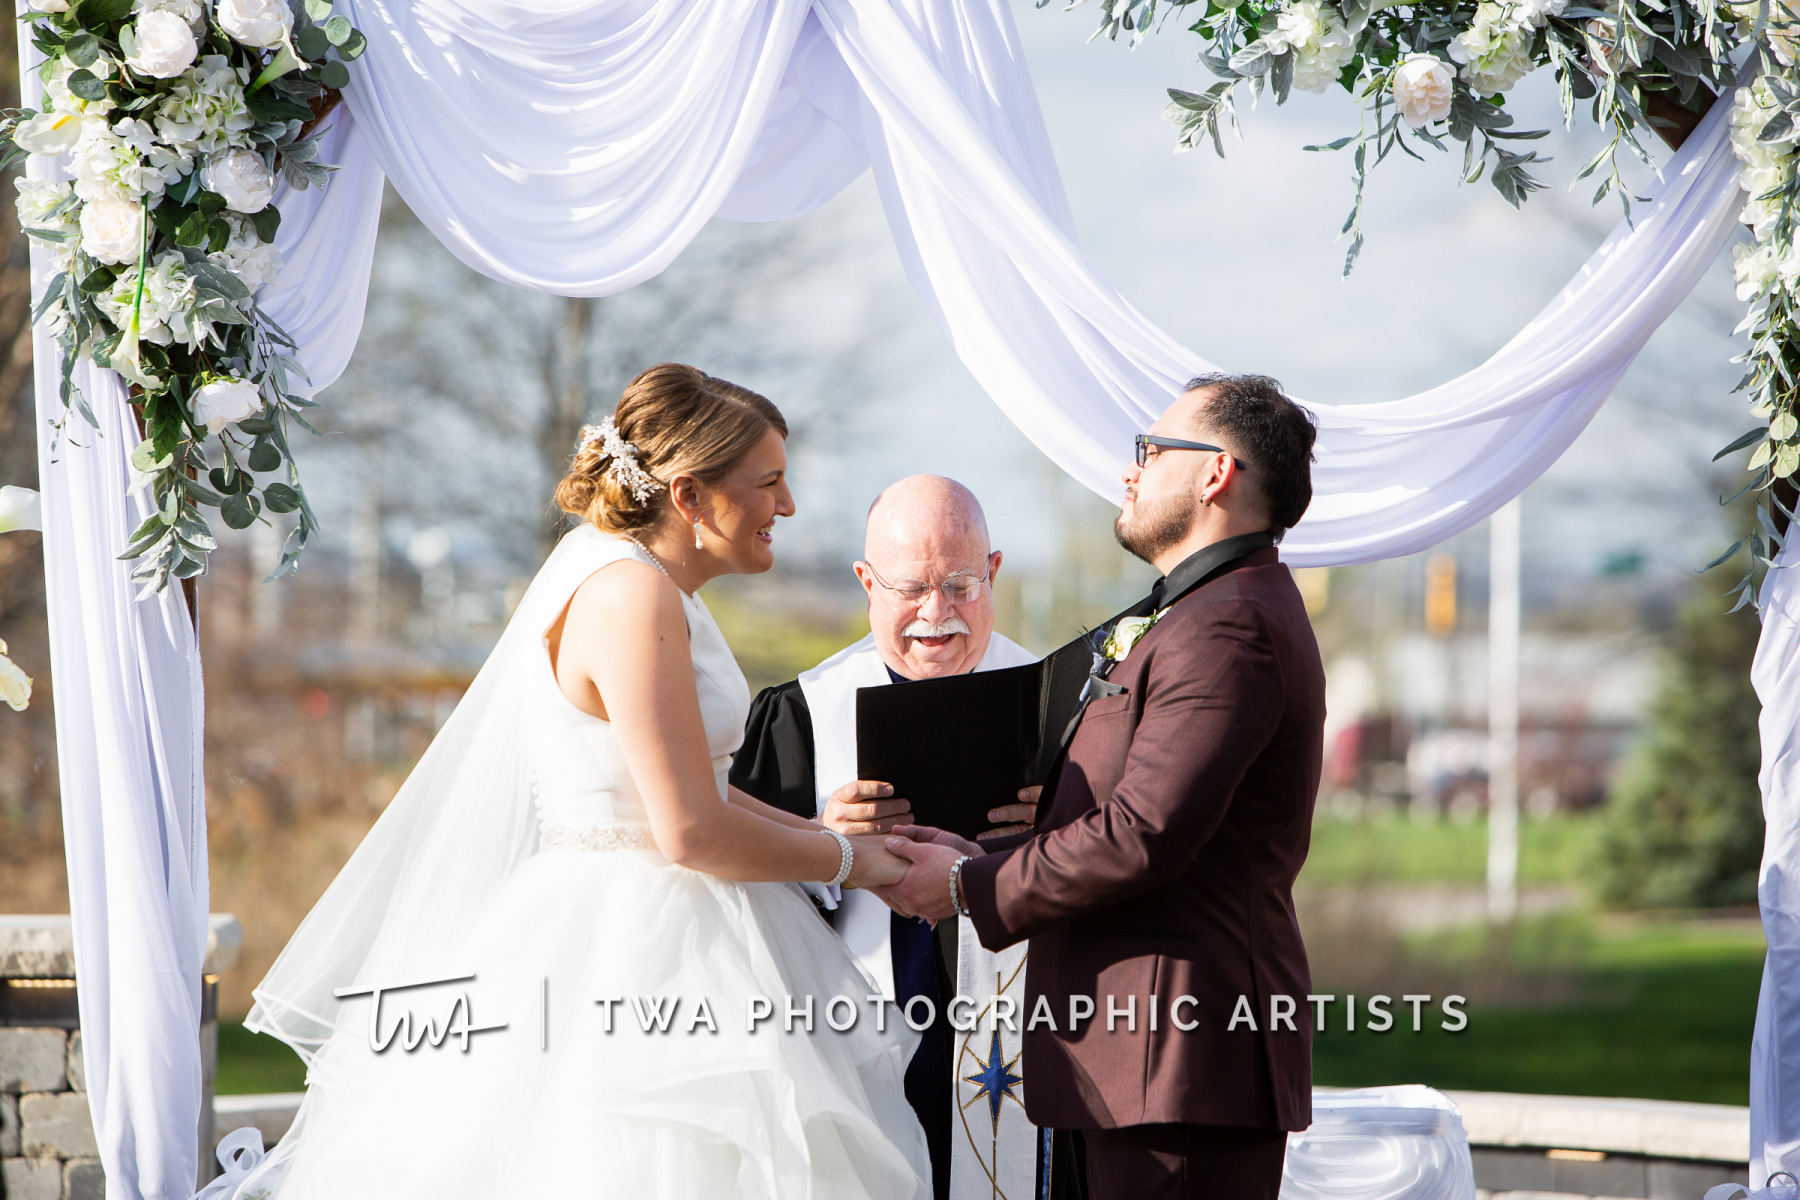 Chicago-Wedding-Photographers-Martini-Banquets_Borys_Caballero_MJ_SG-046-0295